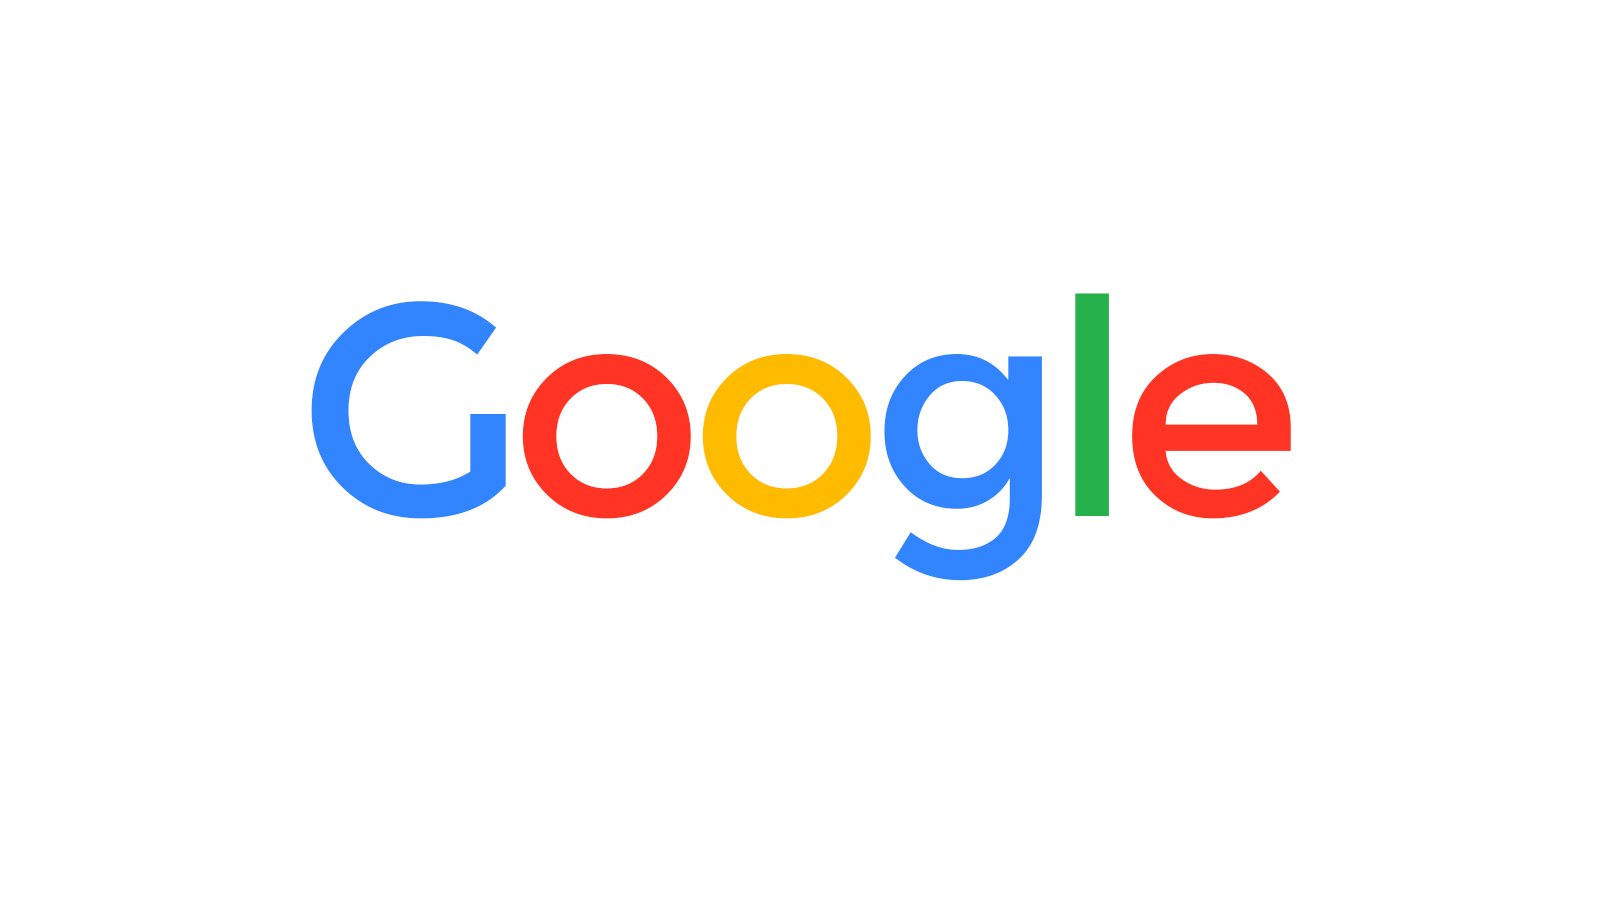 Google, accident attorney plantation